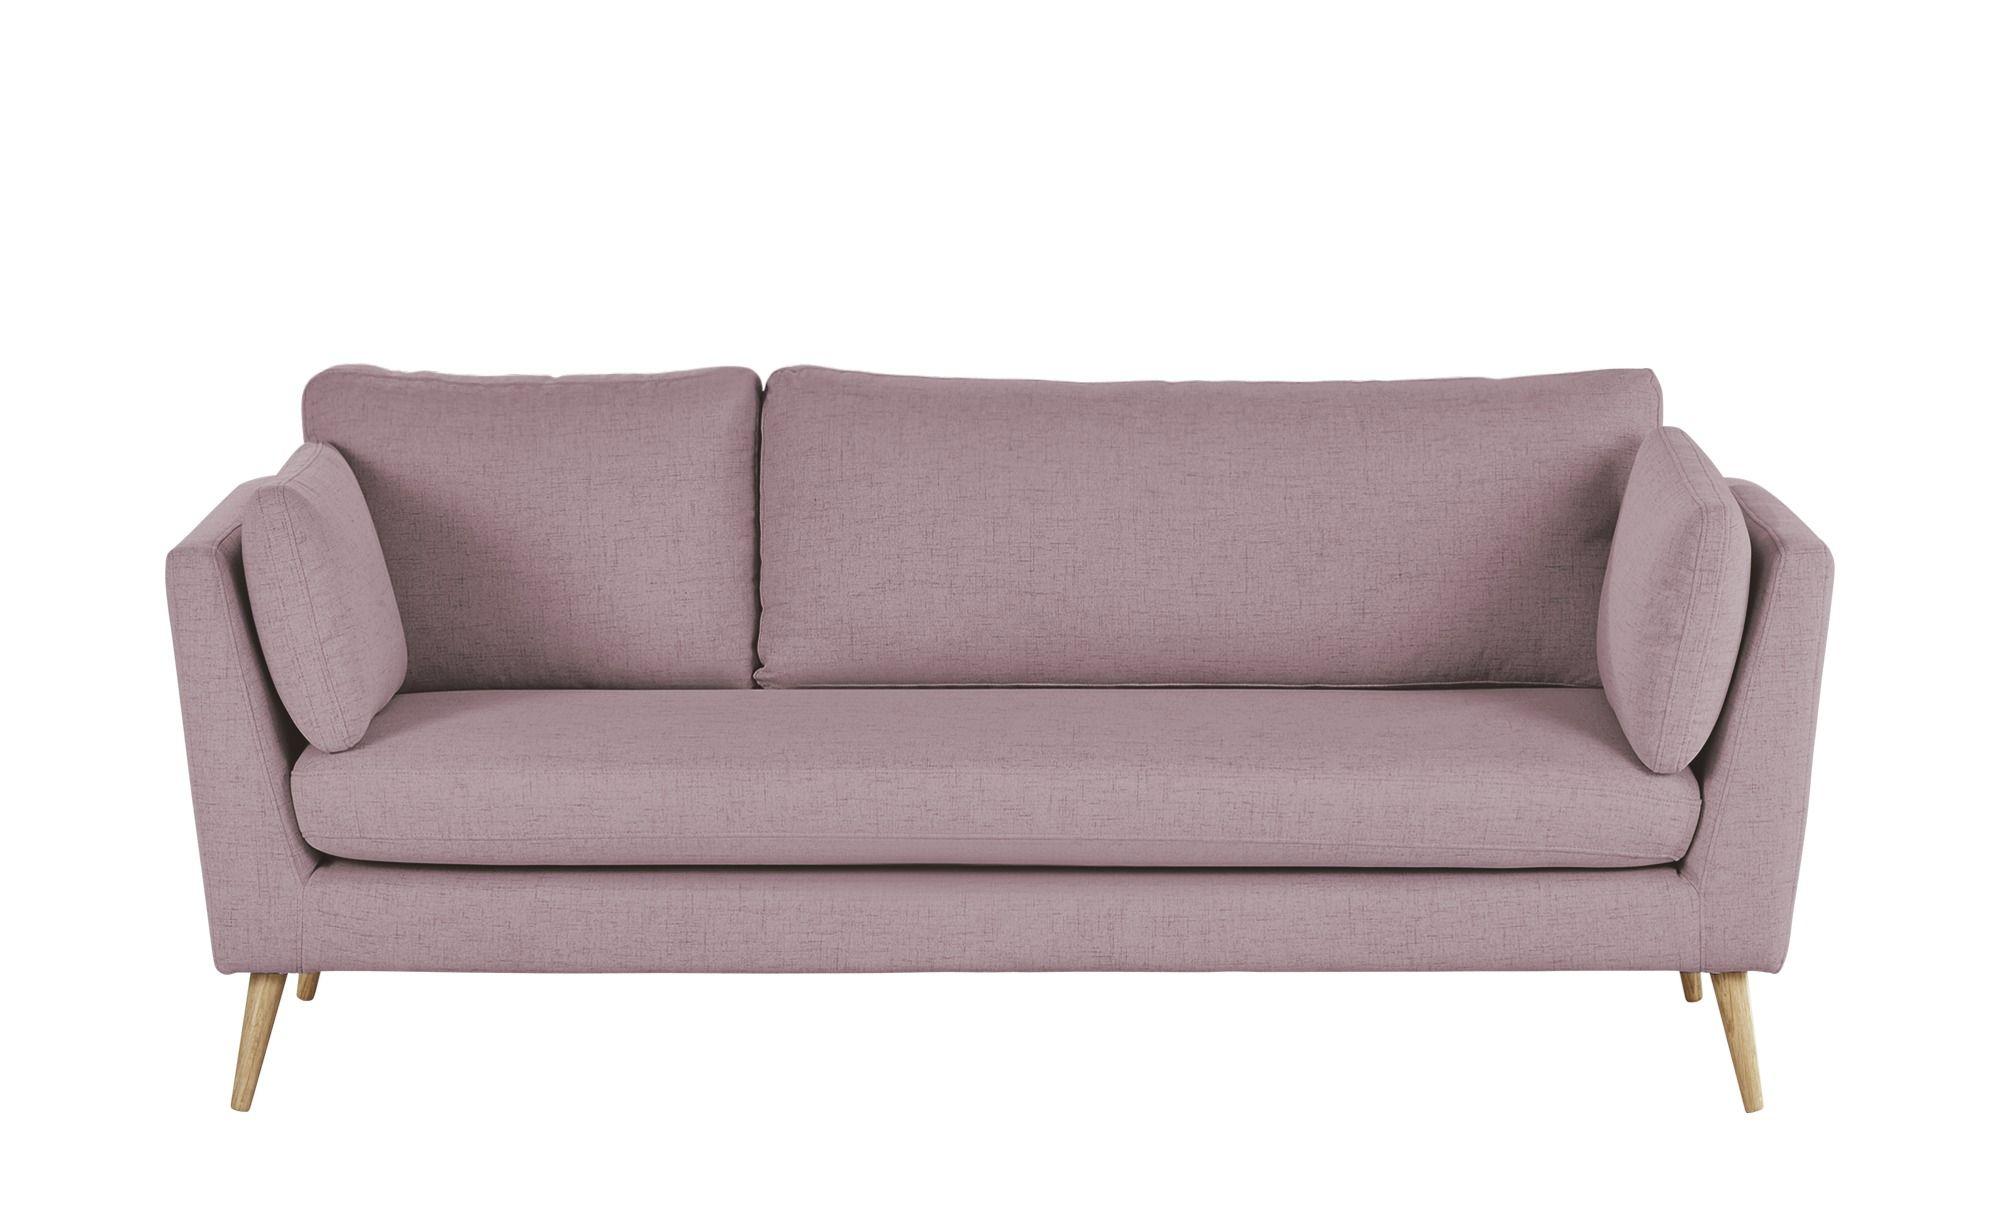 Finya Skandi Sofa Graublau Webstoff Jane Gunstige Sofas Sofa Design Und Big Sofa Kaufen